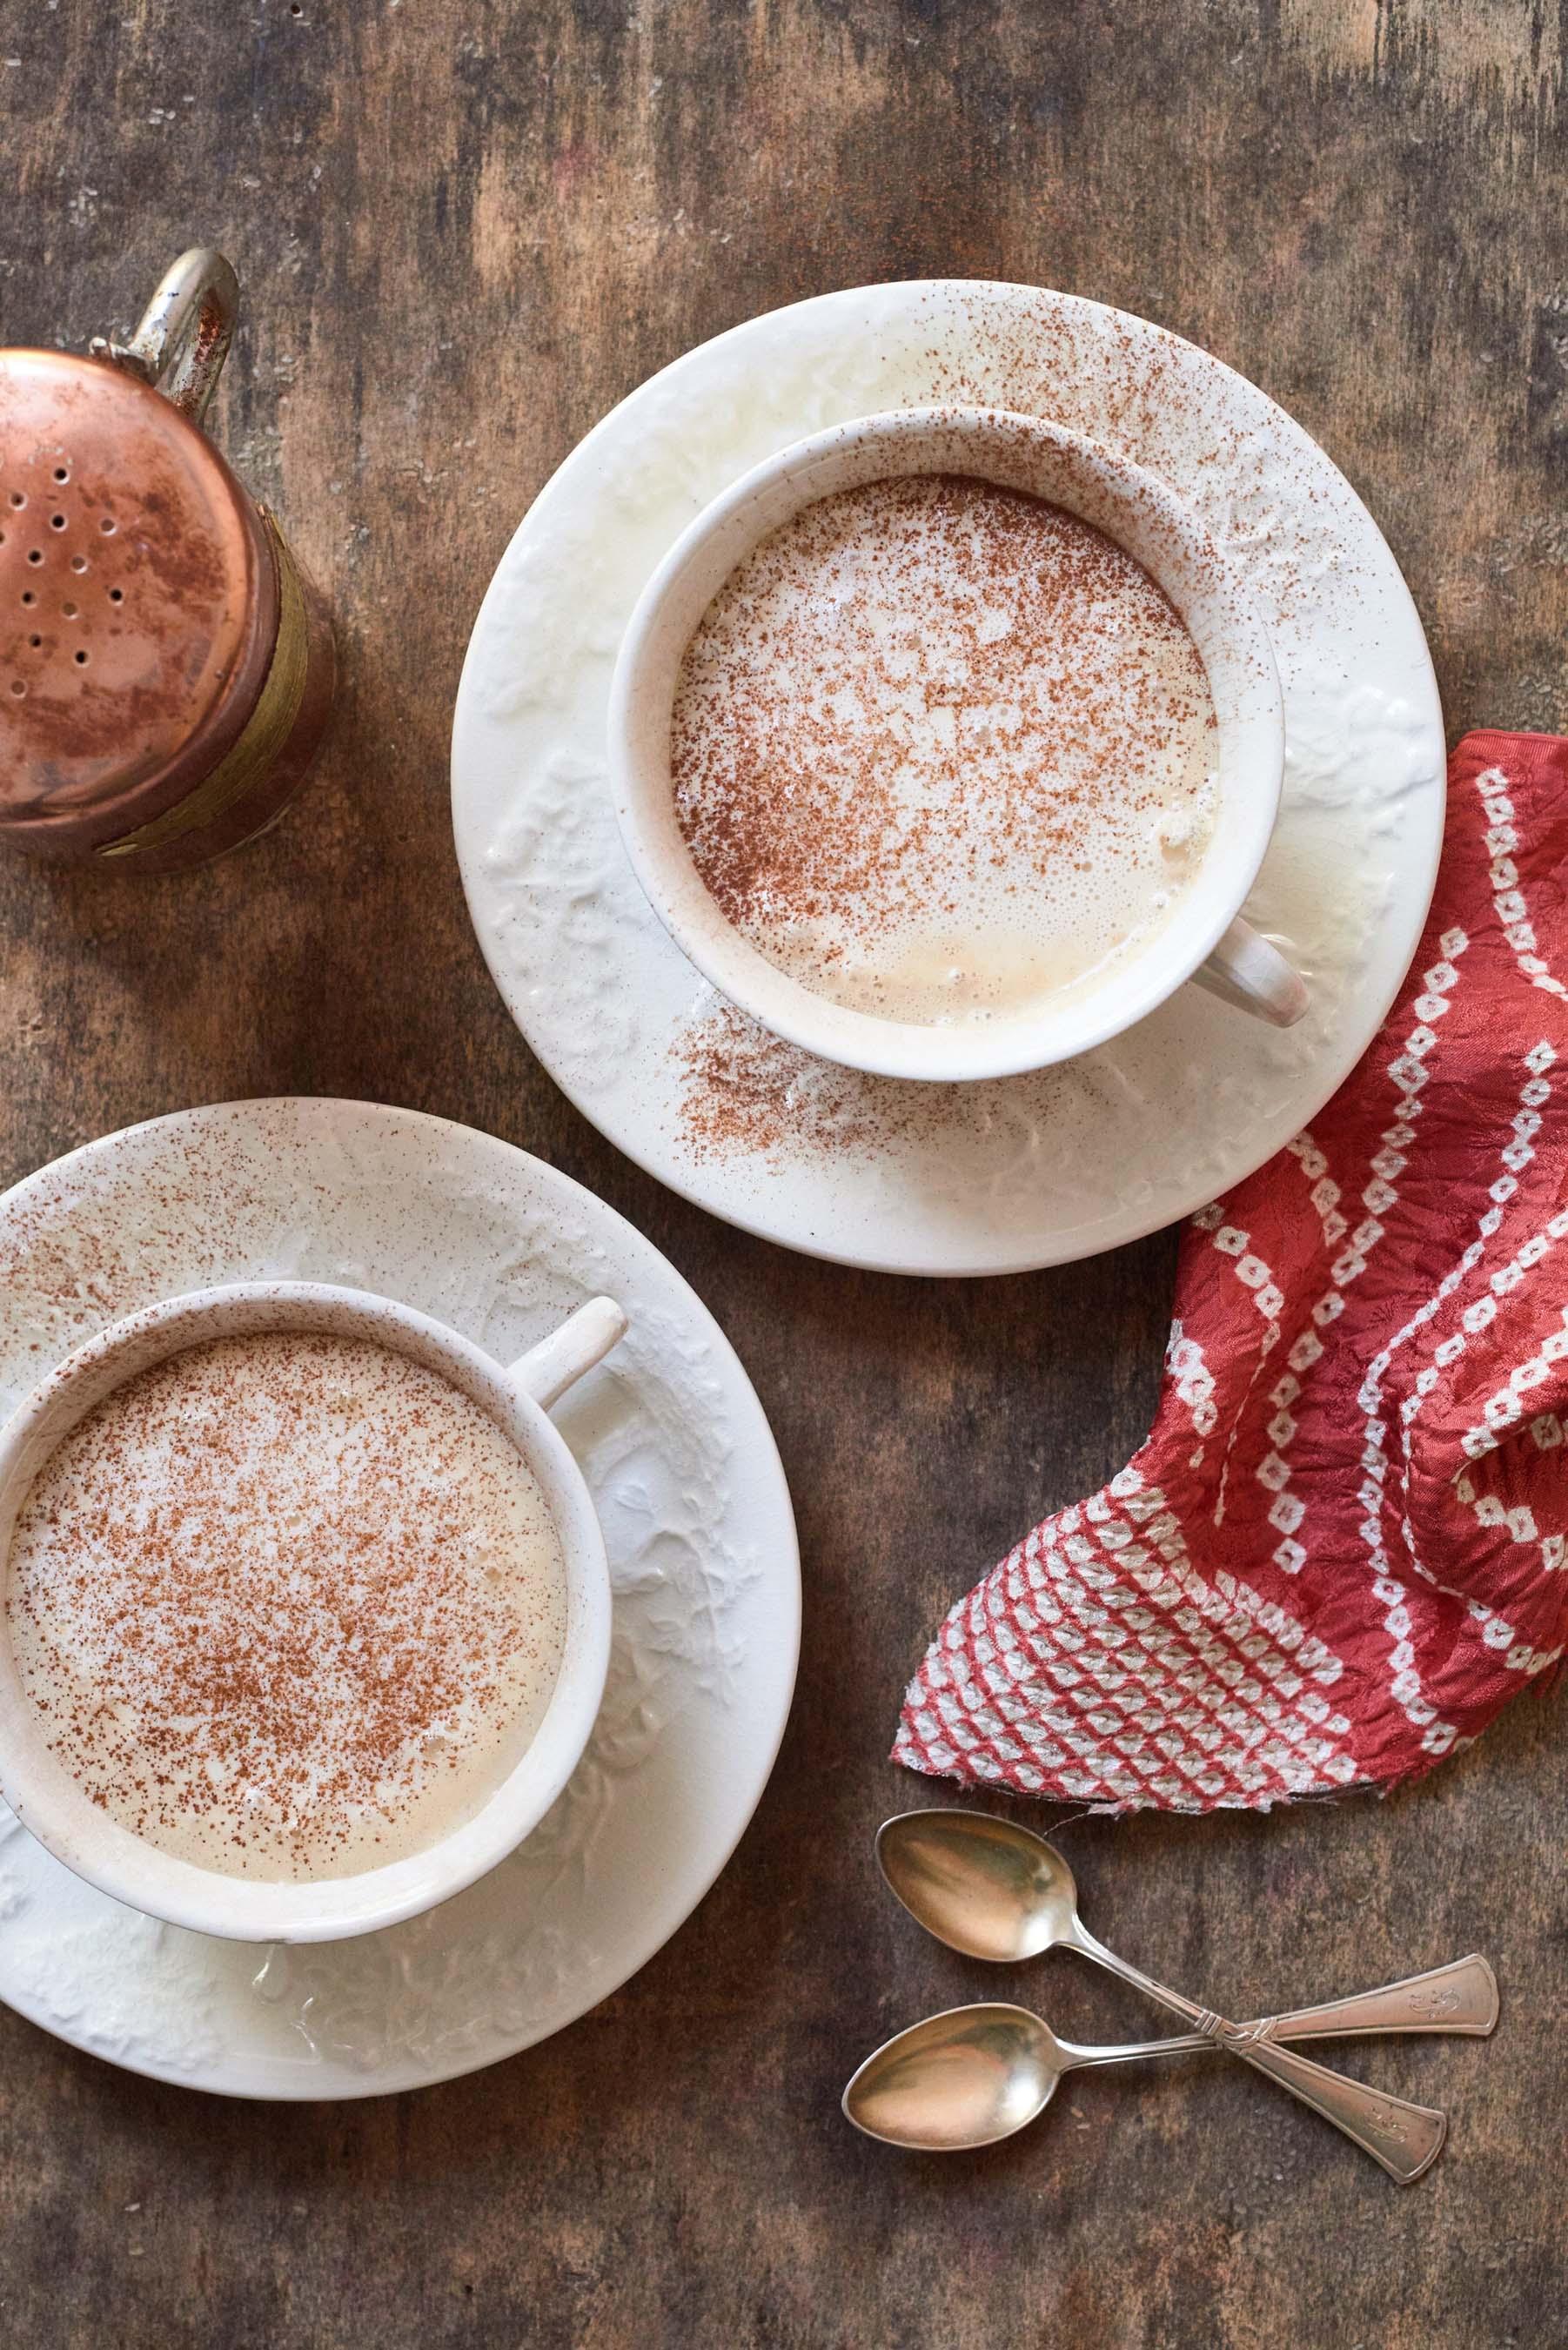 Cinnamon Pumpkin Pie Spice Latte created by Alex Guarnaschelli for Folgers® Simply Gourmet™